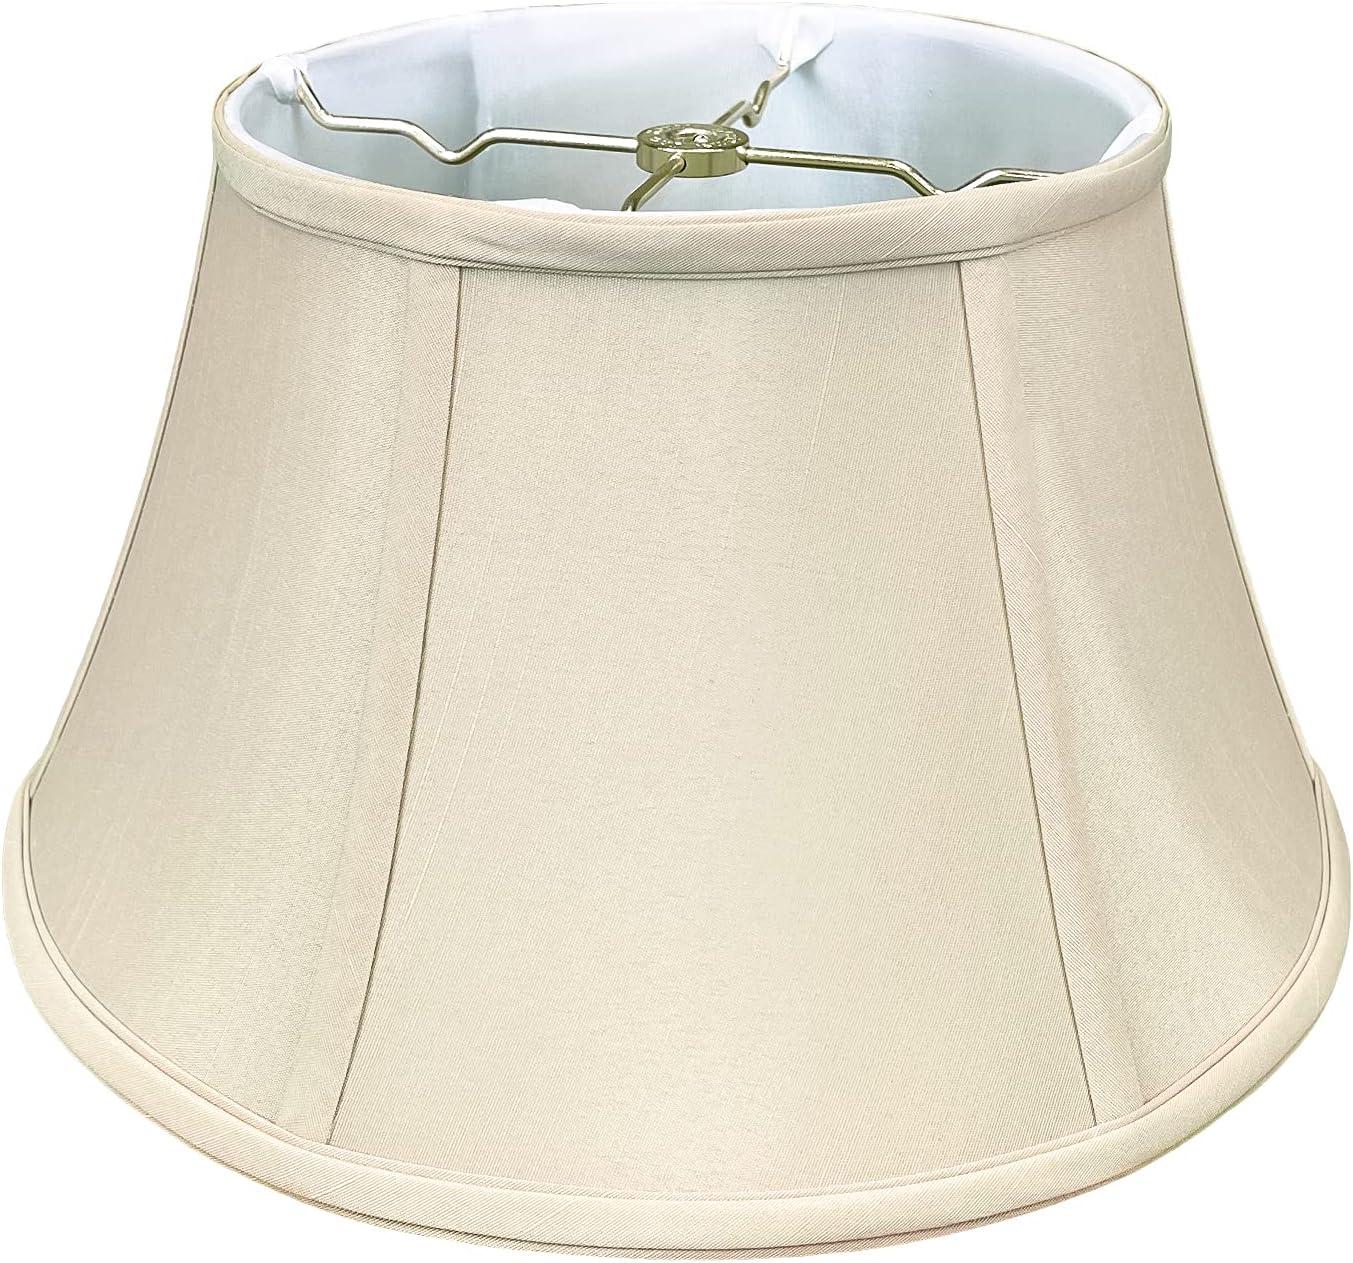 El Paso Mall Royal Designs BS-711-17BG Shallow Drum Lamp Attention brand Billiotte Bell Shade